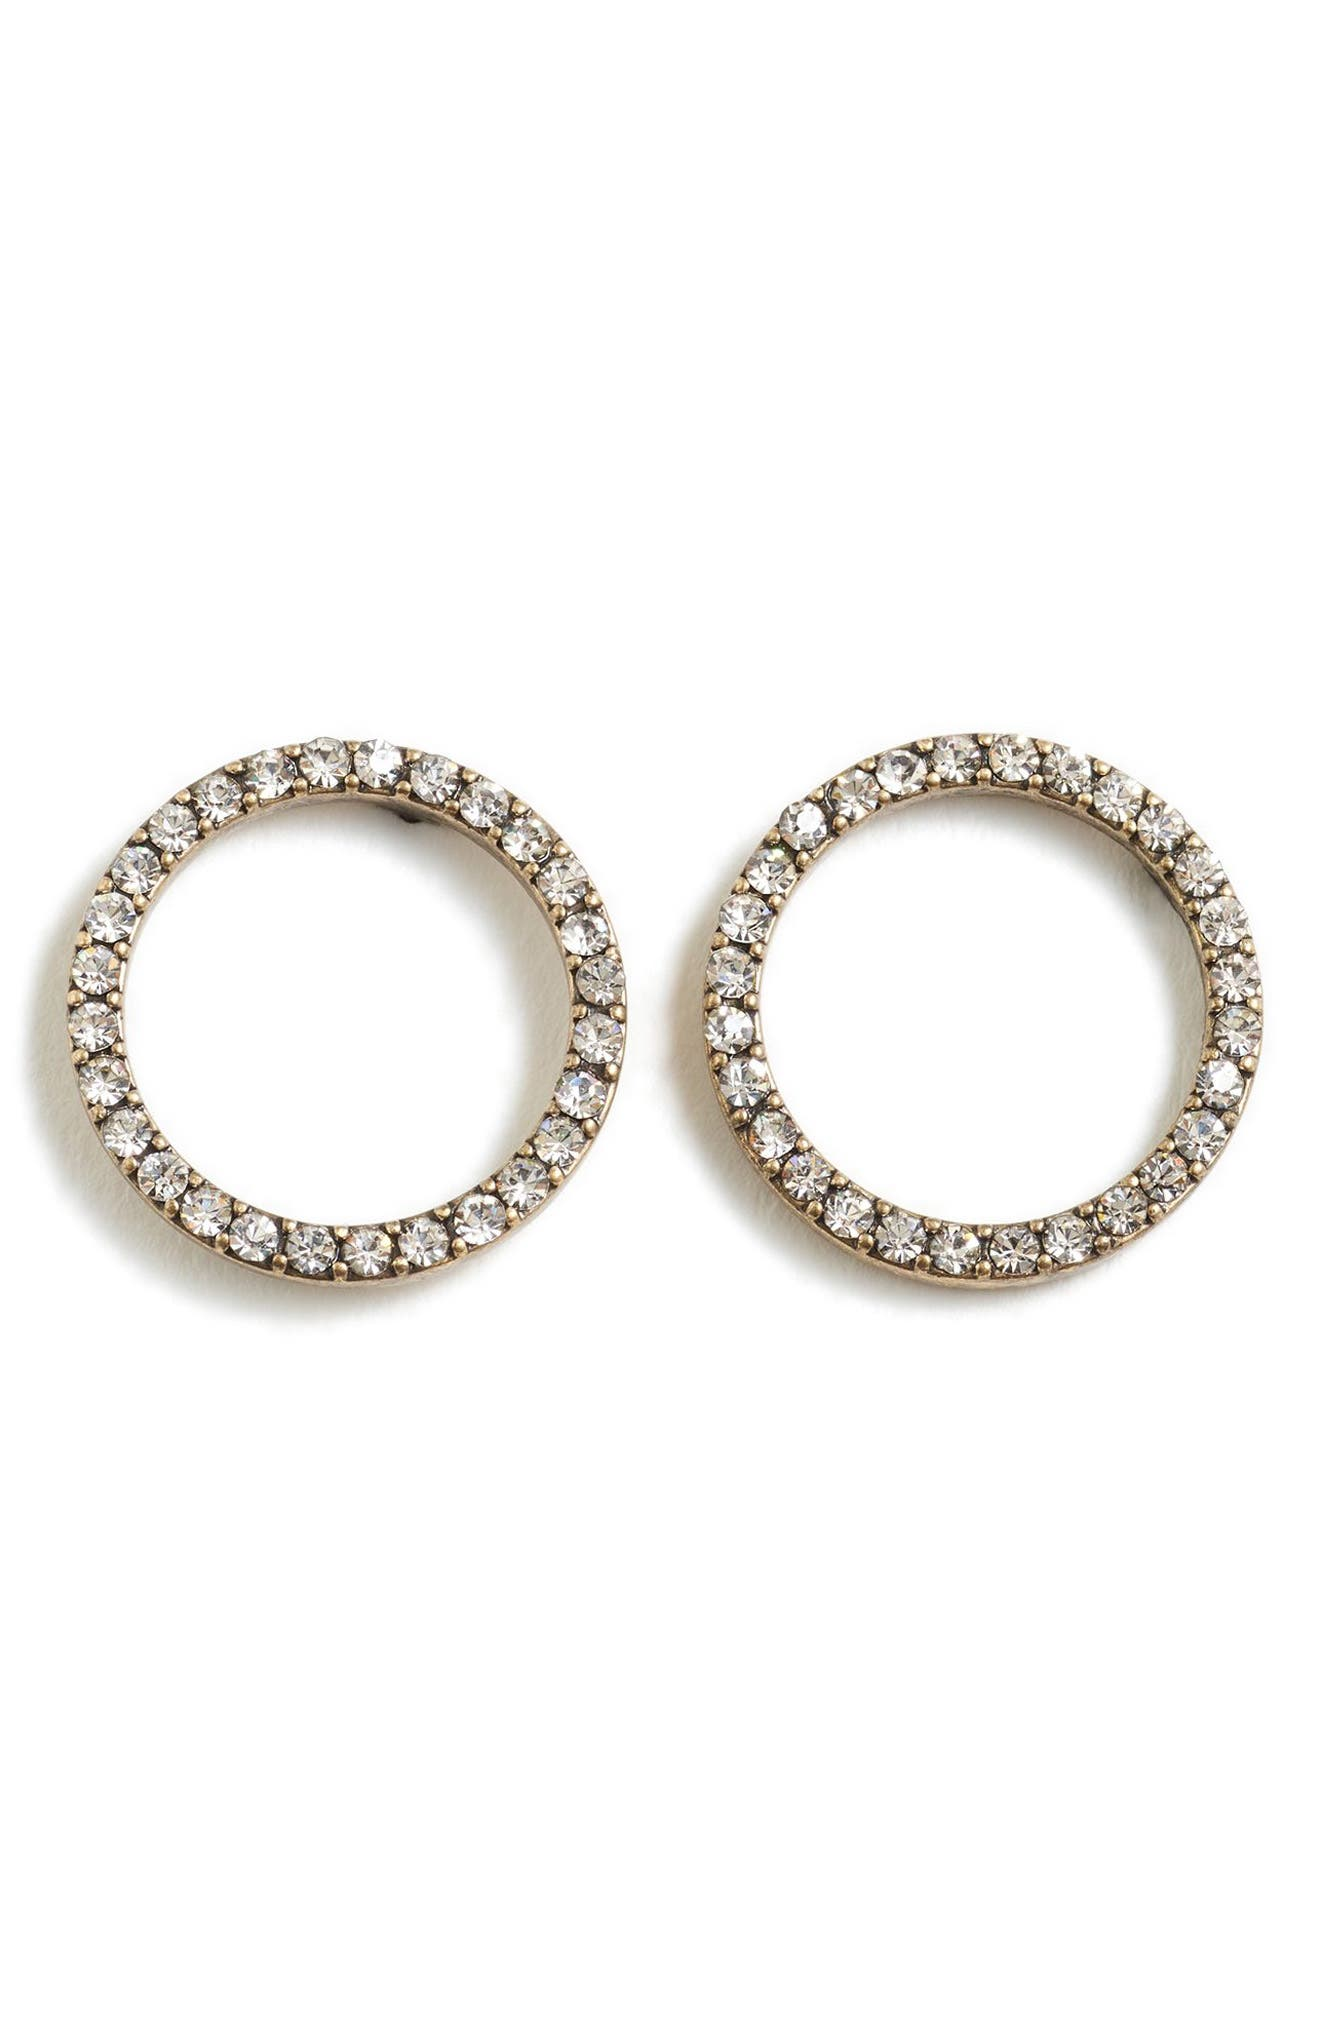 Pavé Circle Earrings,                             Main thumbnail 1, color,                             040